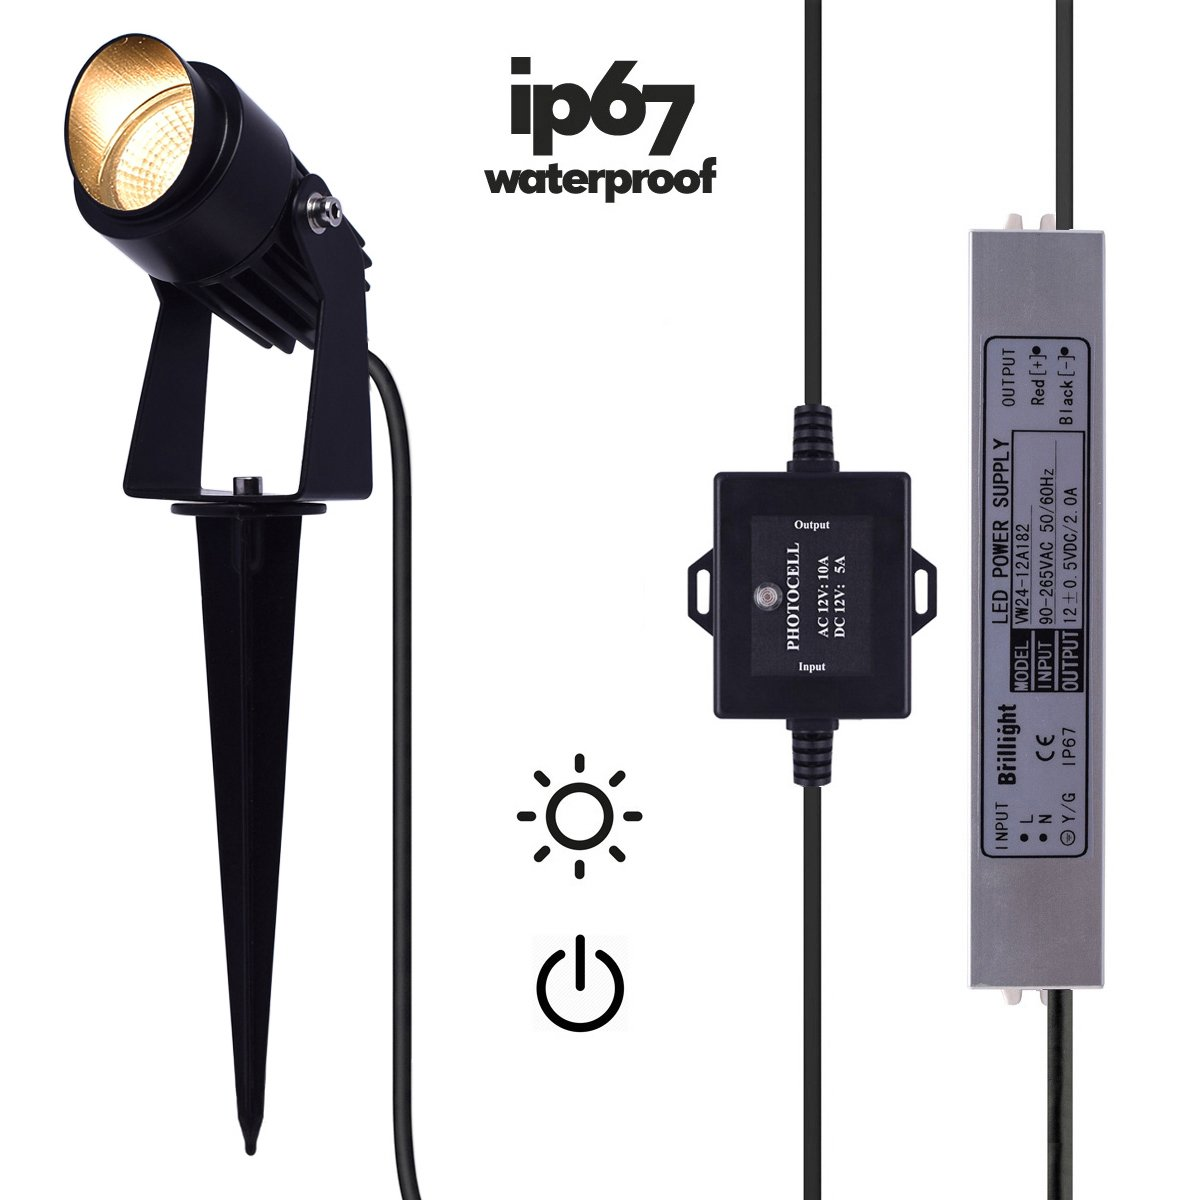 6-Pack 3W 12V LED Landscape Spotlight Hooded Spike Light Kit incl Waterproof Power Supply & Photocell Sensor Switch ( Warm White 3000K )